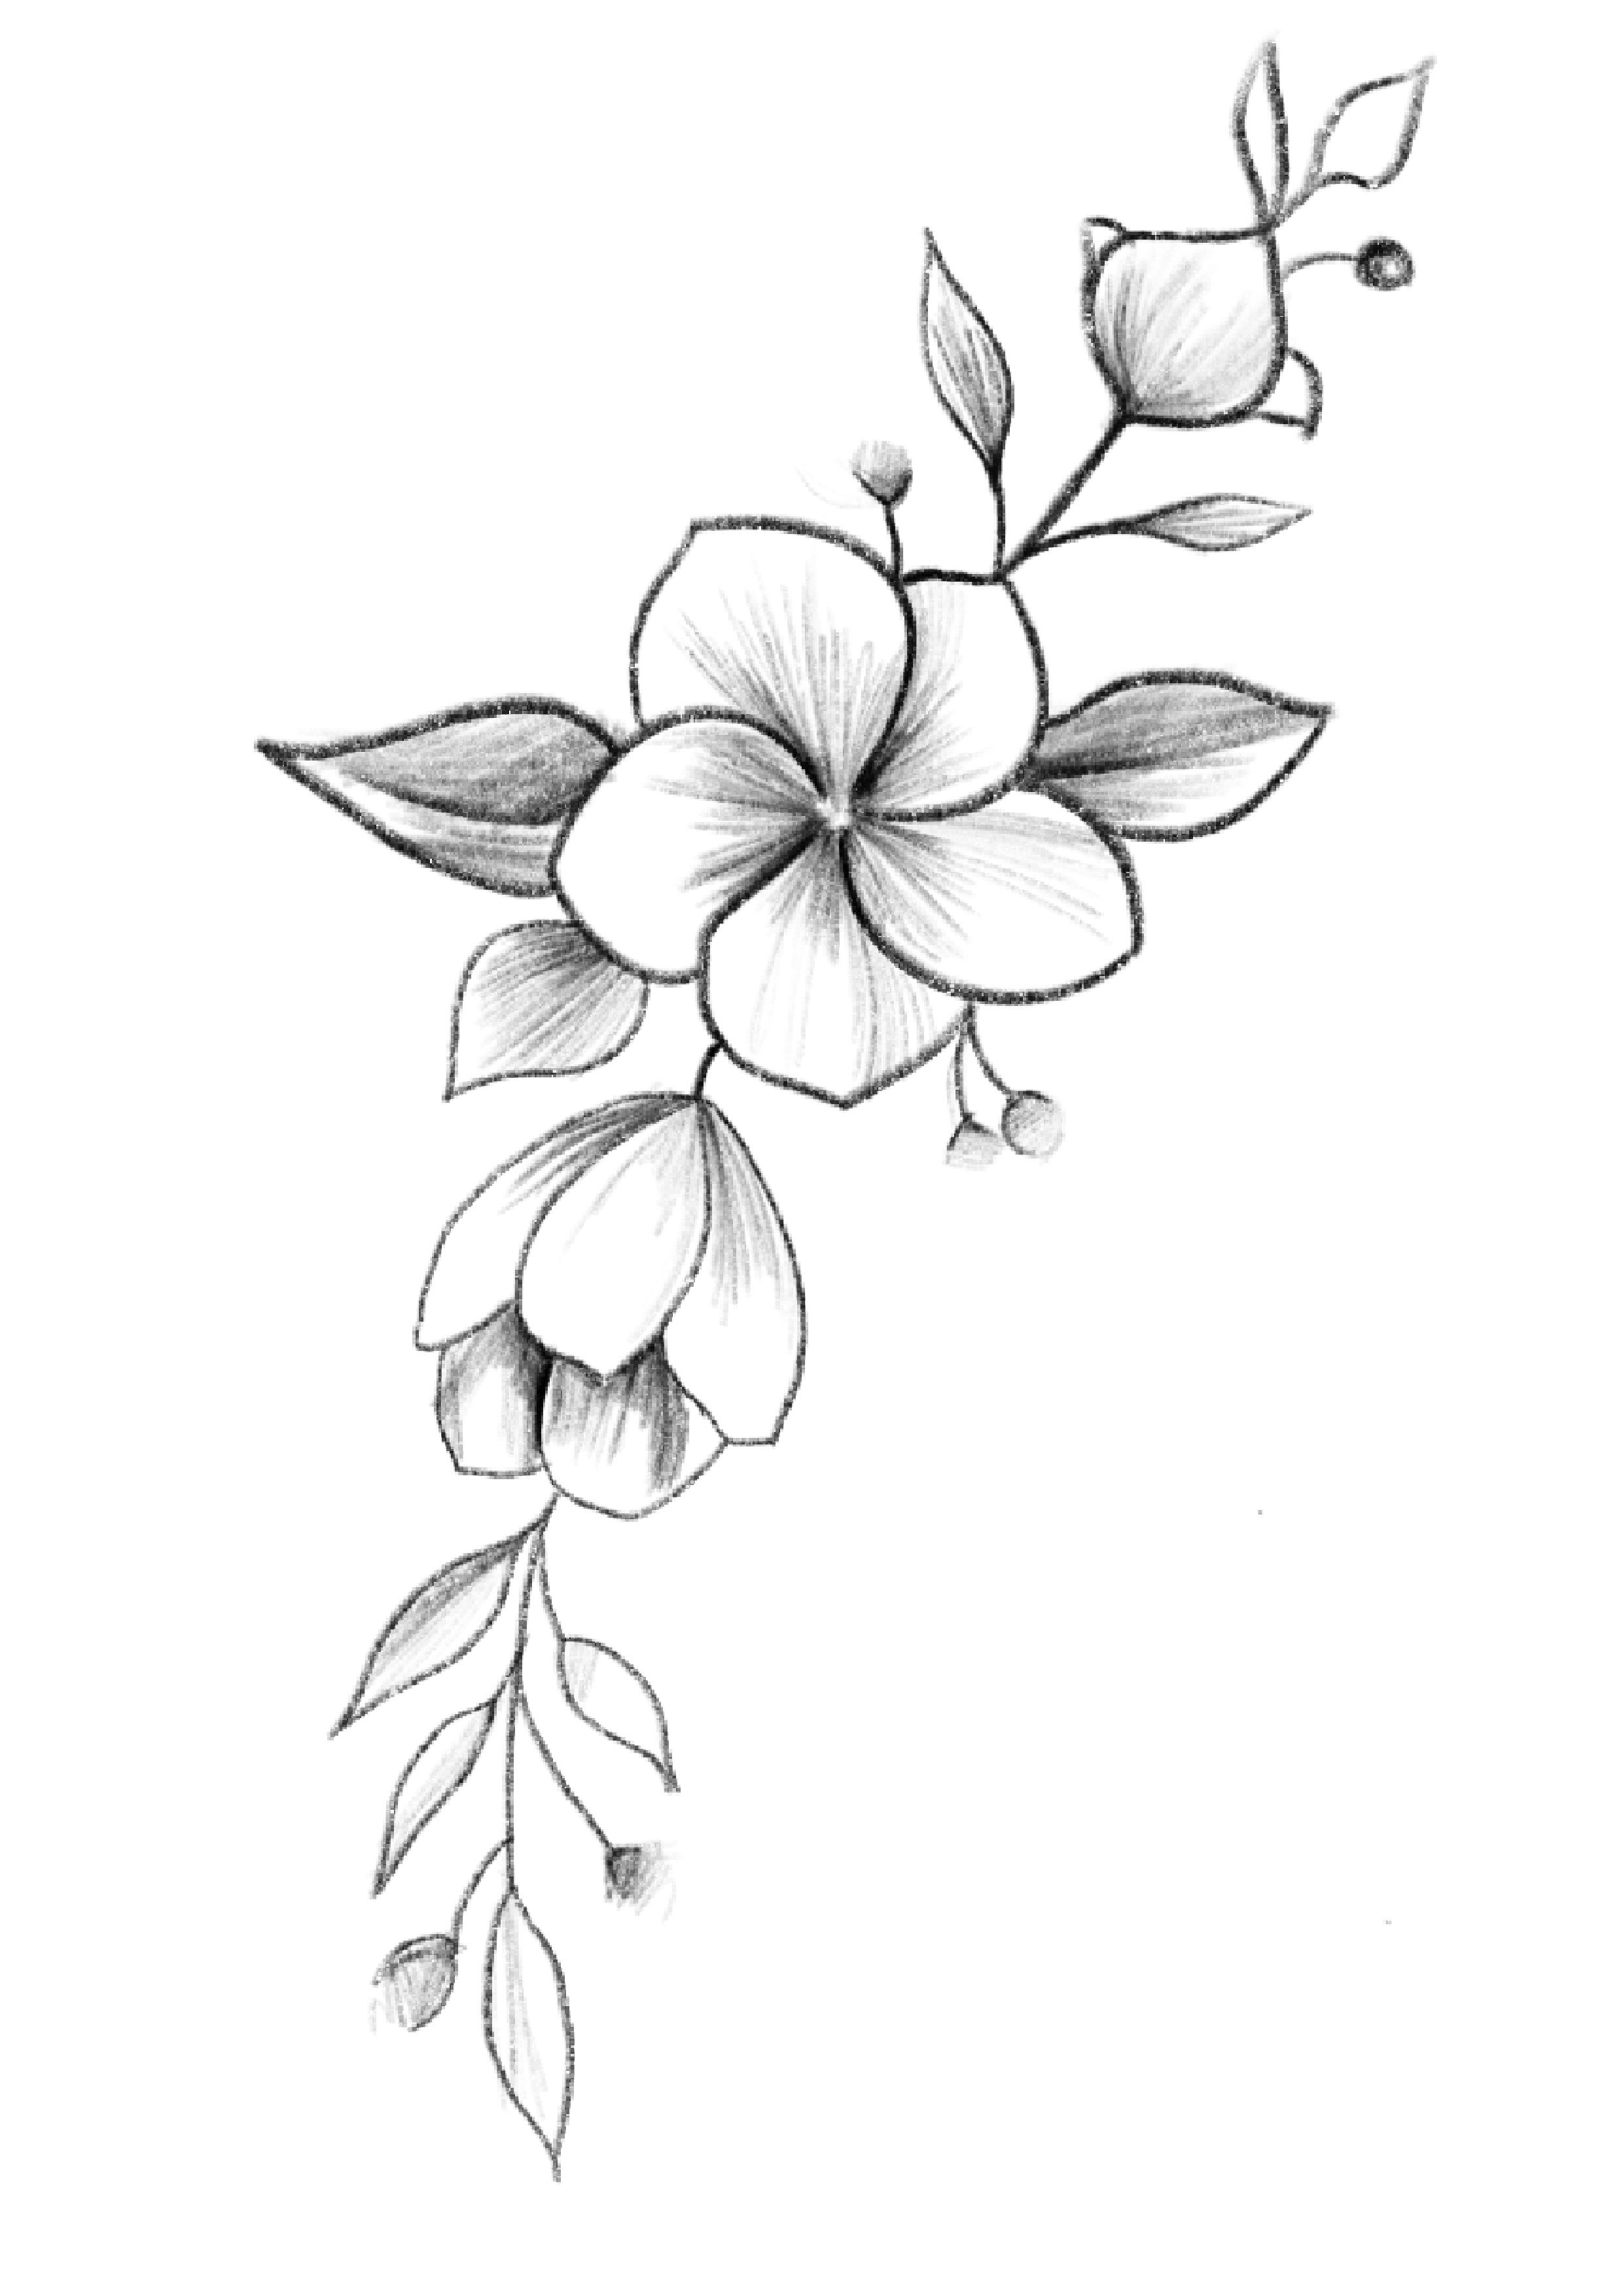 Untitled In 2020 Pencil Drawings Of Flowers Flower Art Drawing Flower Drawing